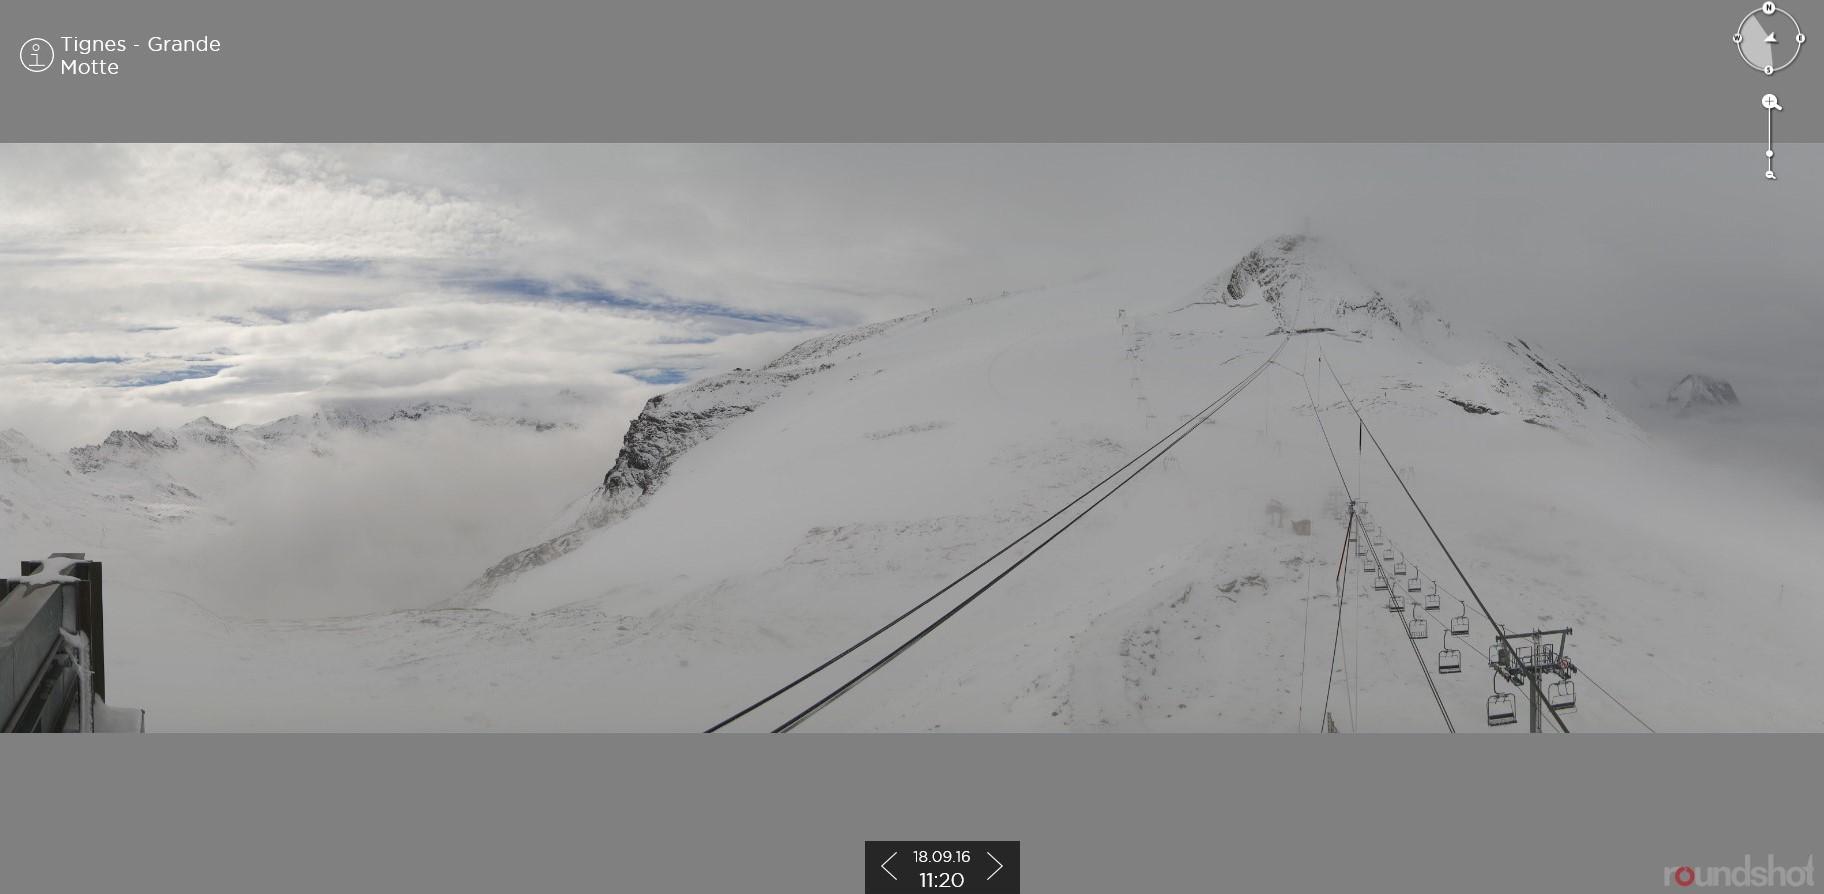 Nowcasting nivo-glaciali Alpi autunno 2016-grande-motte-18.09.16.jpg